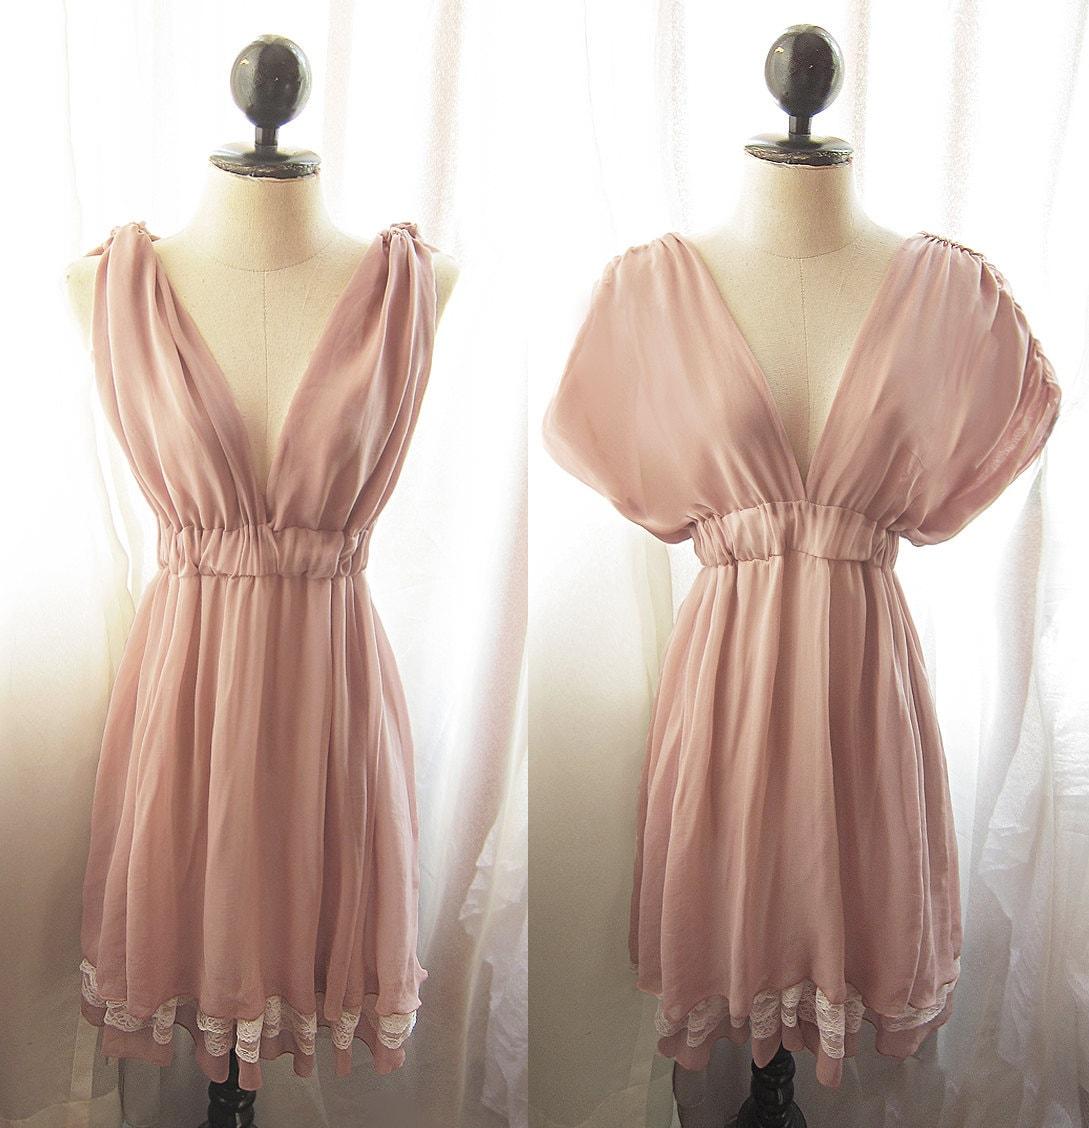 River of Romansk Blush Dusty Pink Rose Kimono Dress Peach Rustic Goddess Marie Antoinette Romantic Bridesmaid Chiffon Lace Hem Grecian Dress